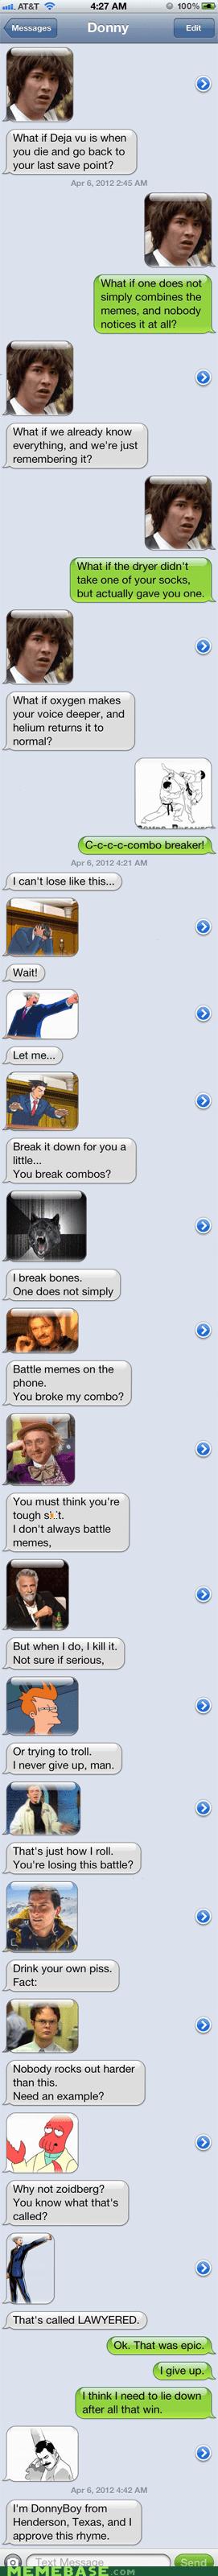 Battle combo breaker conspiracy keanu phone texts - 6099194624